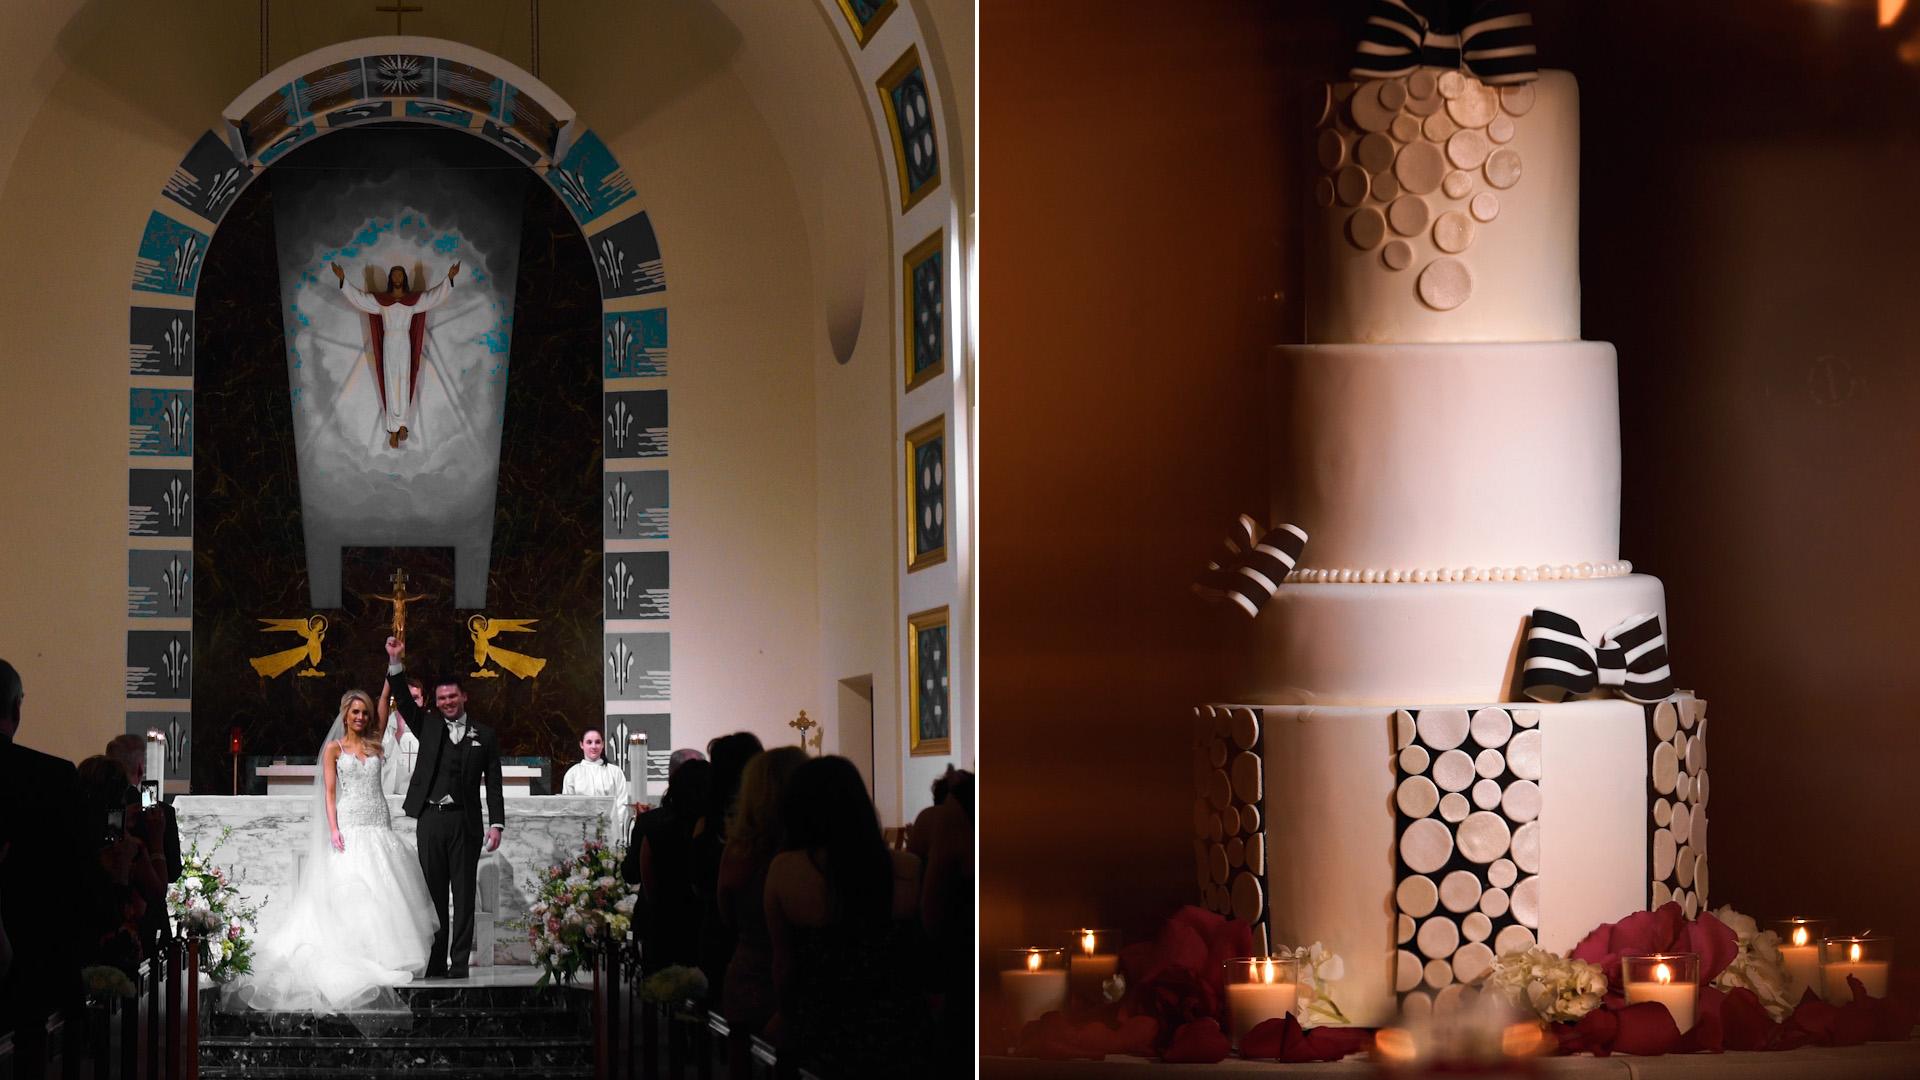 CEREMONY CAKE.jpg